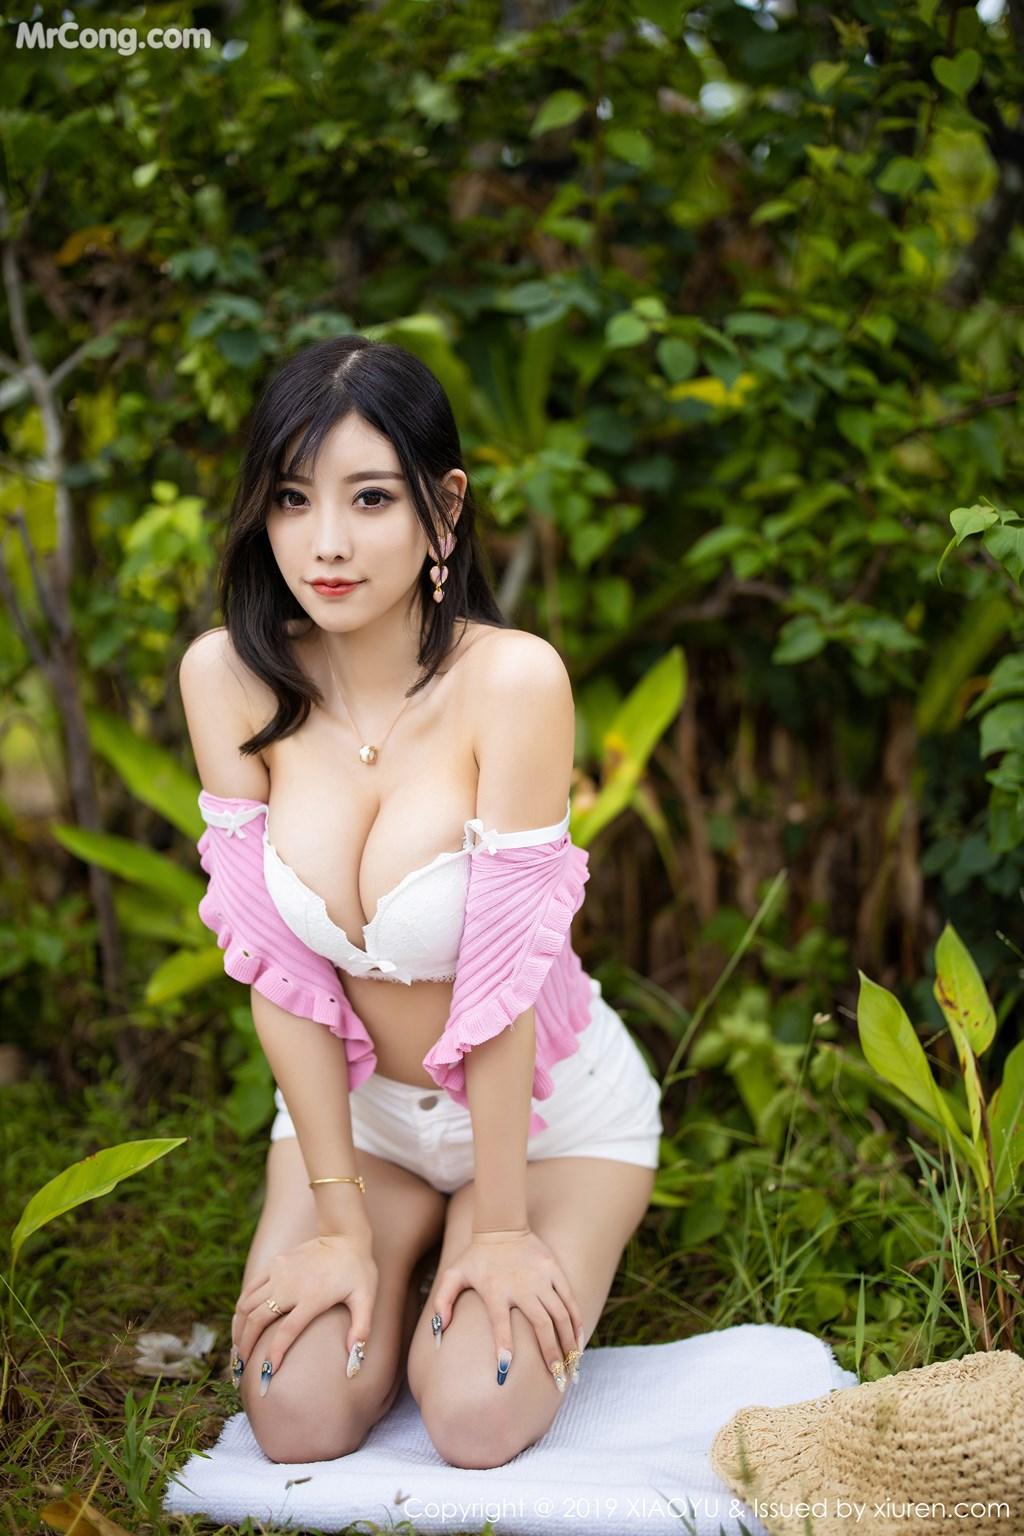 XiaoYu Vol.169: Yang Chen Chen (杨晨晨sugar) (64P)